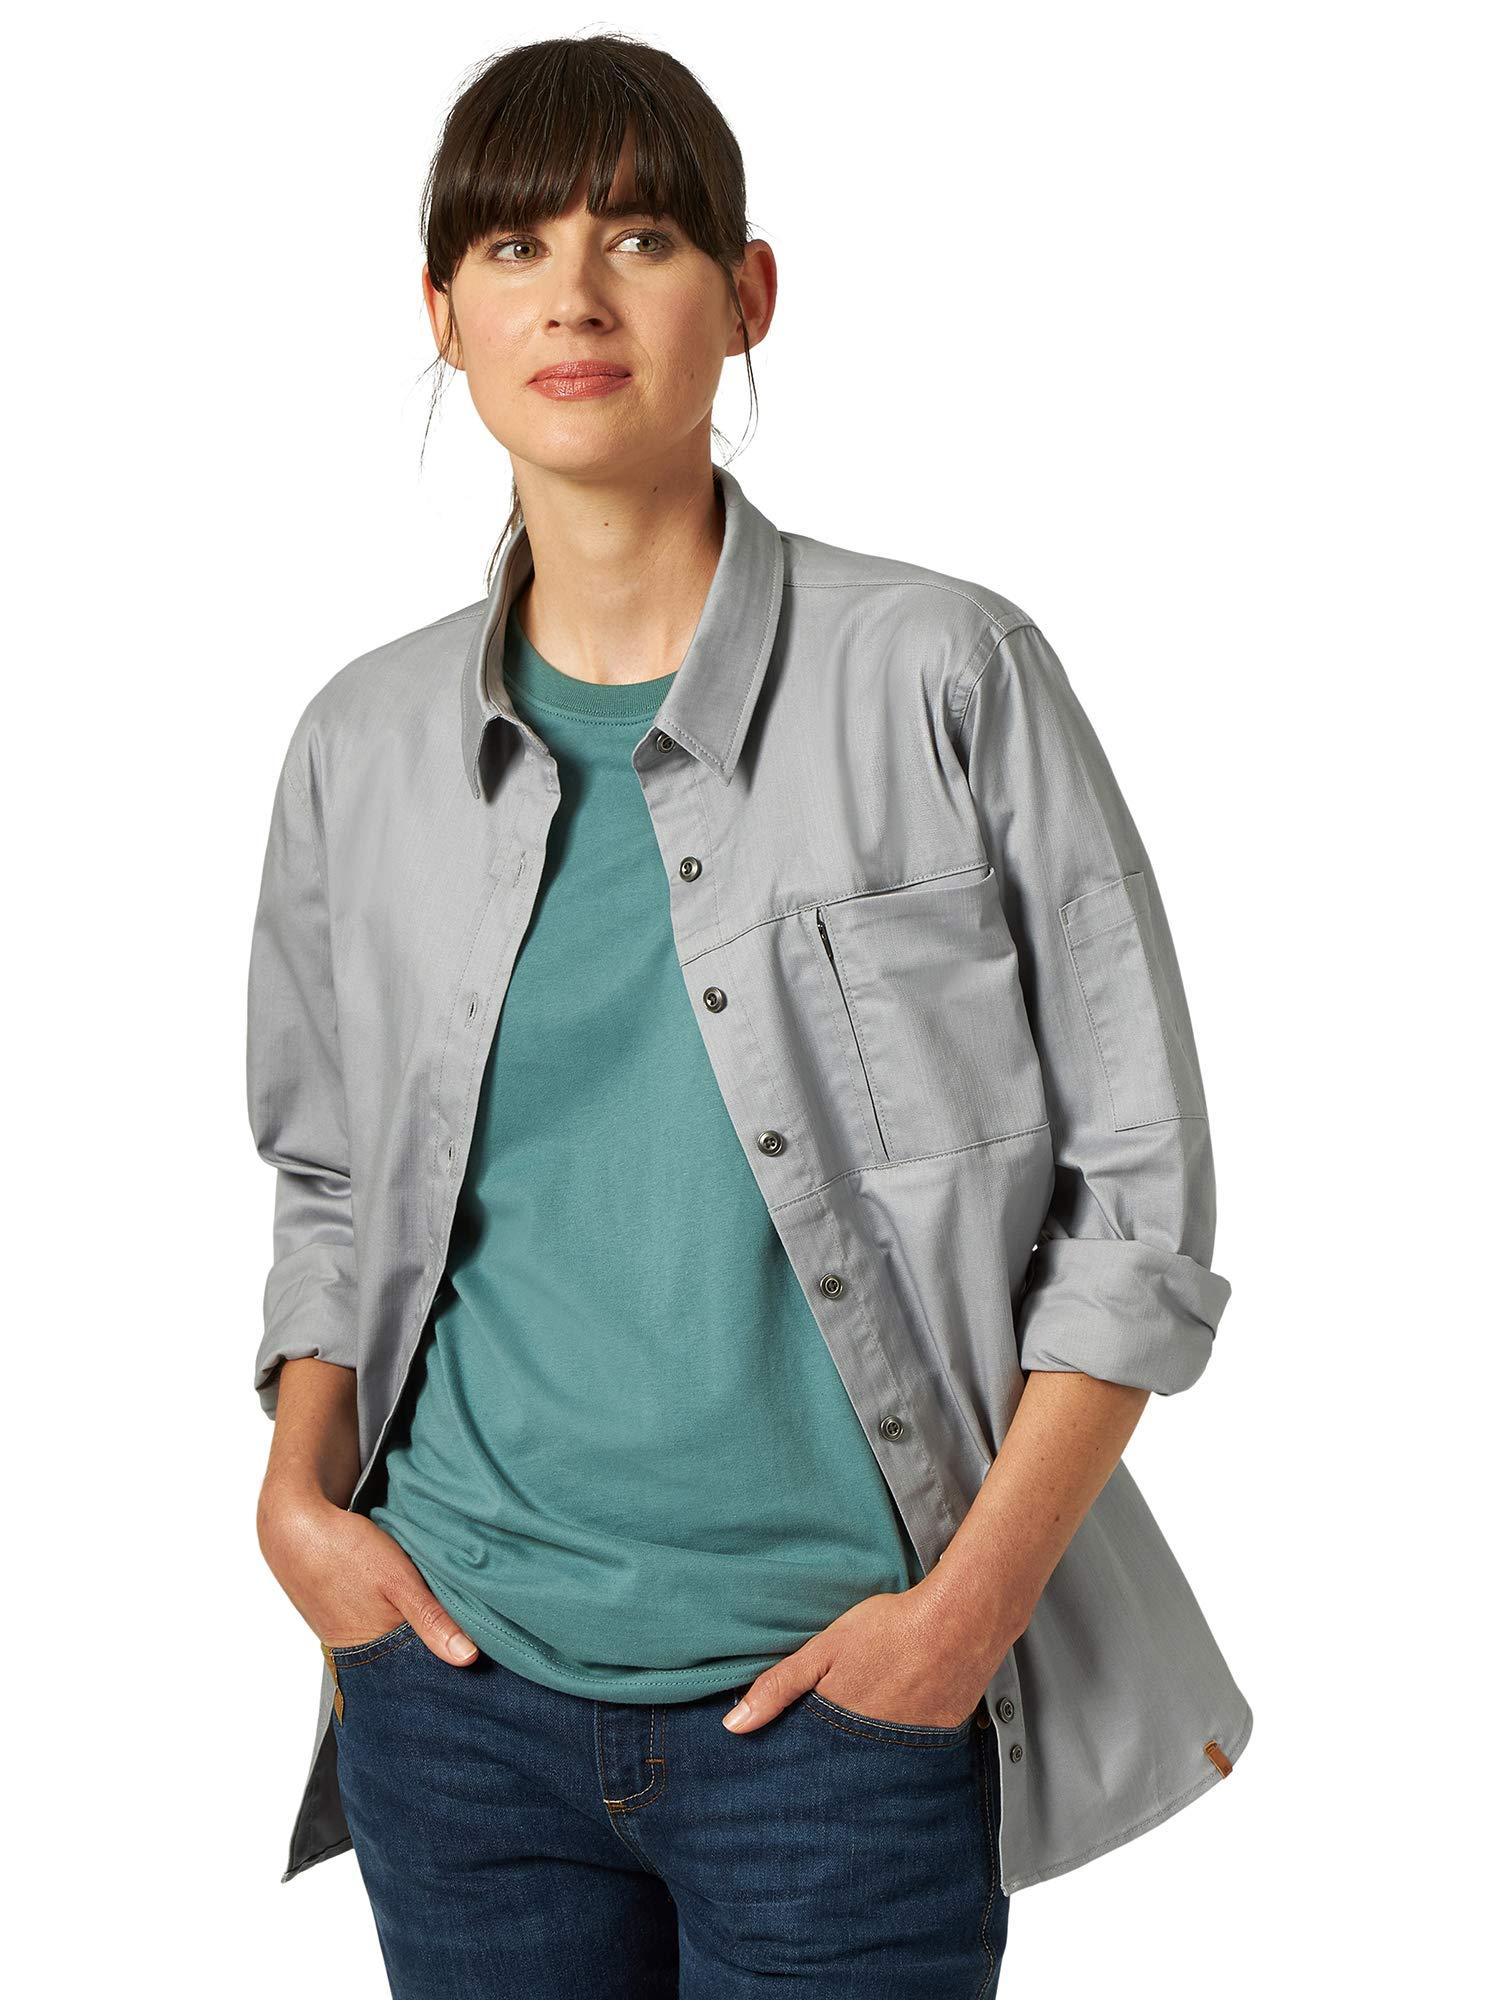 Wrangler Riggs Workwear Women's Long Sleeve One Pocket Workshirt